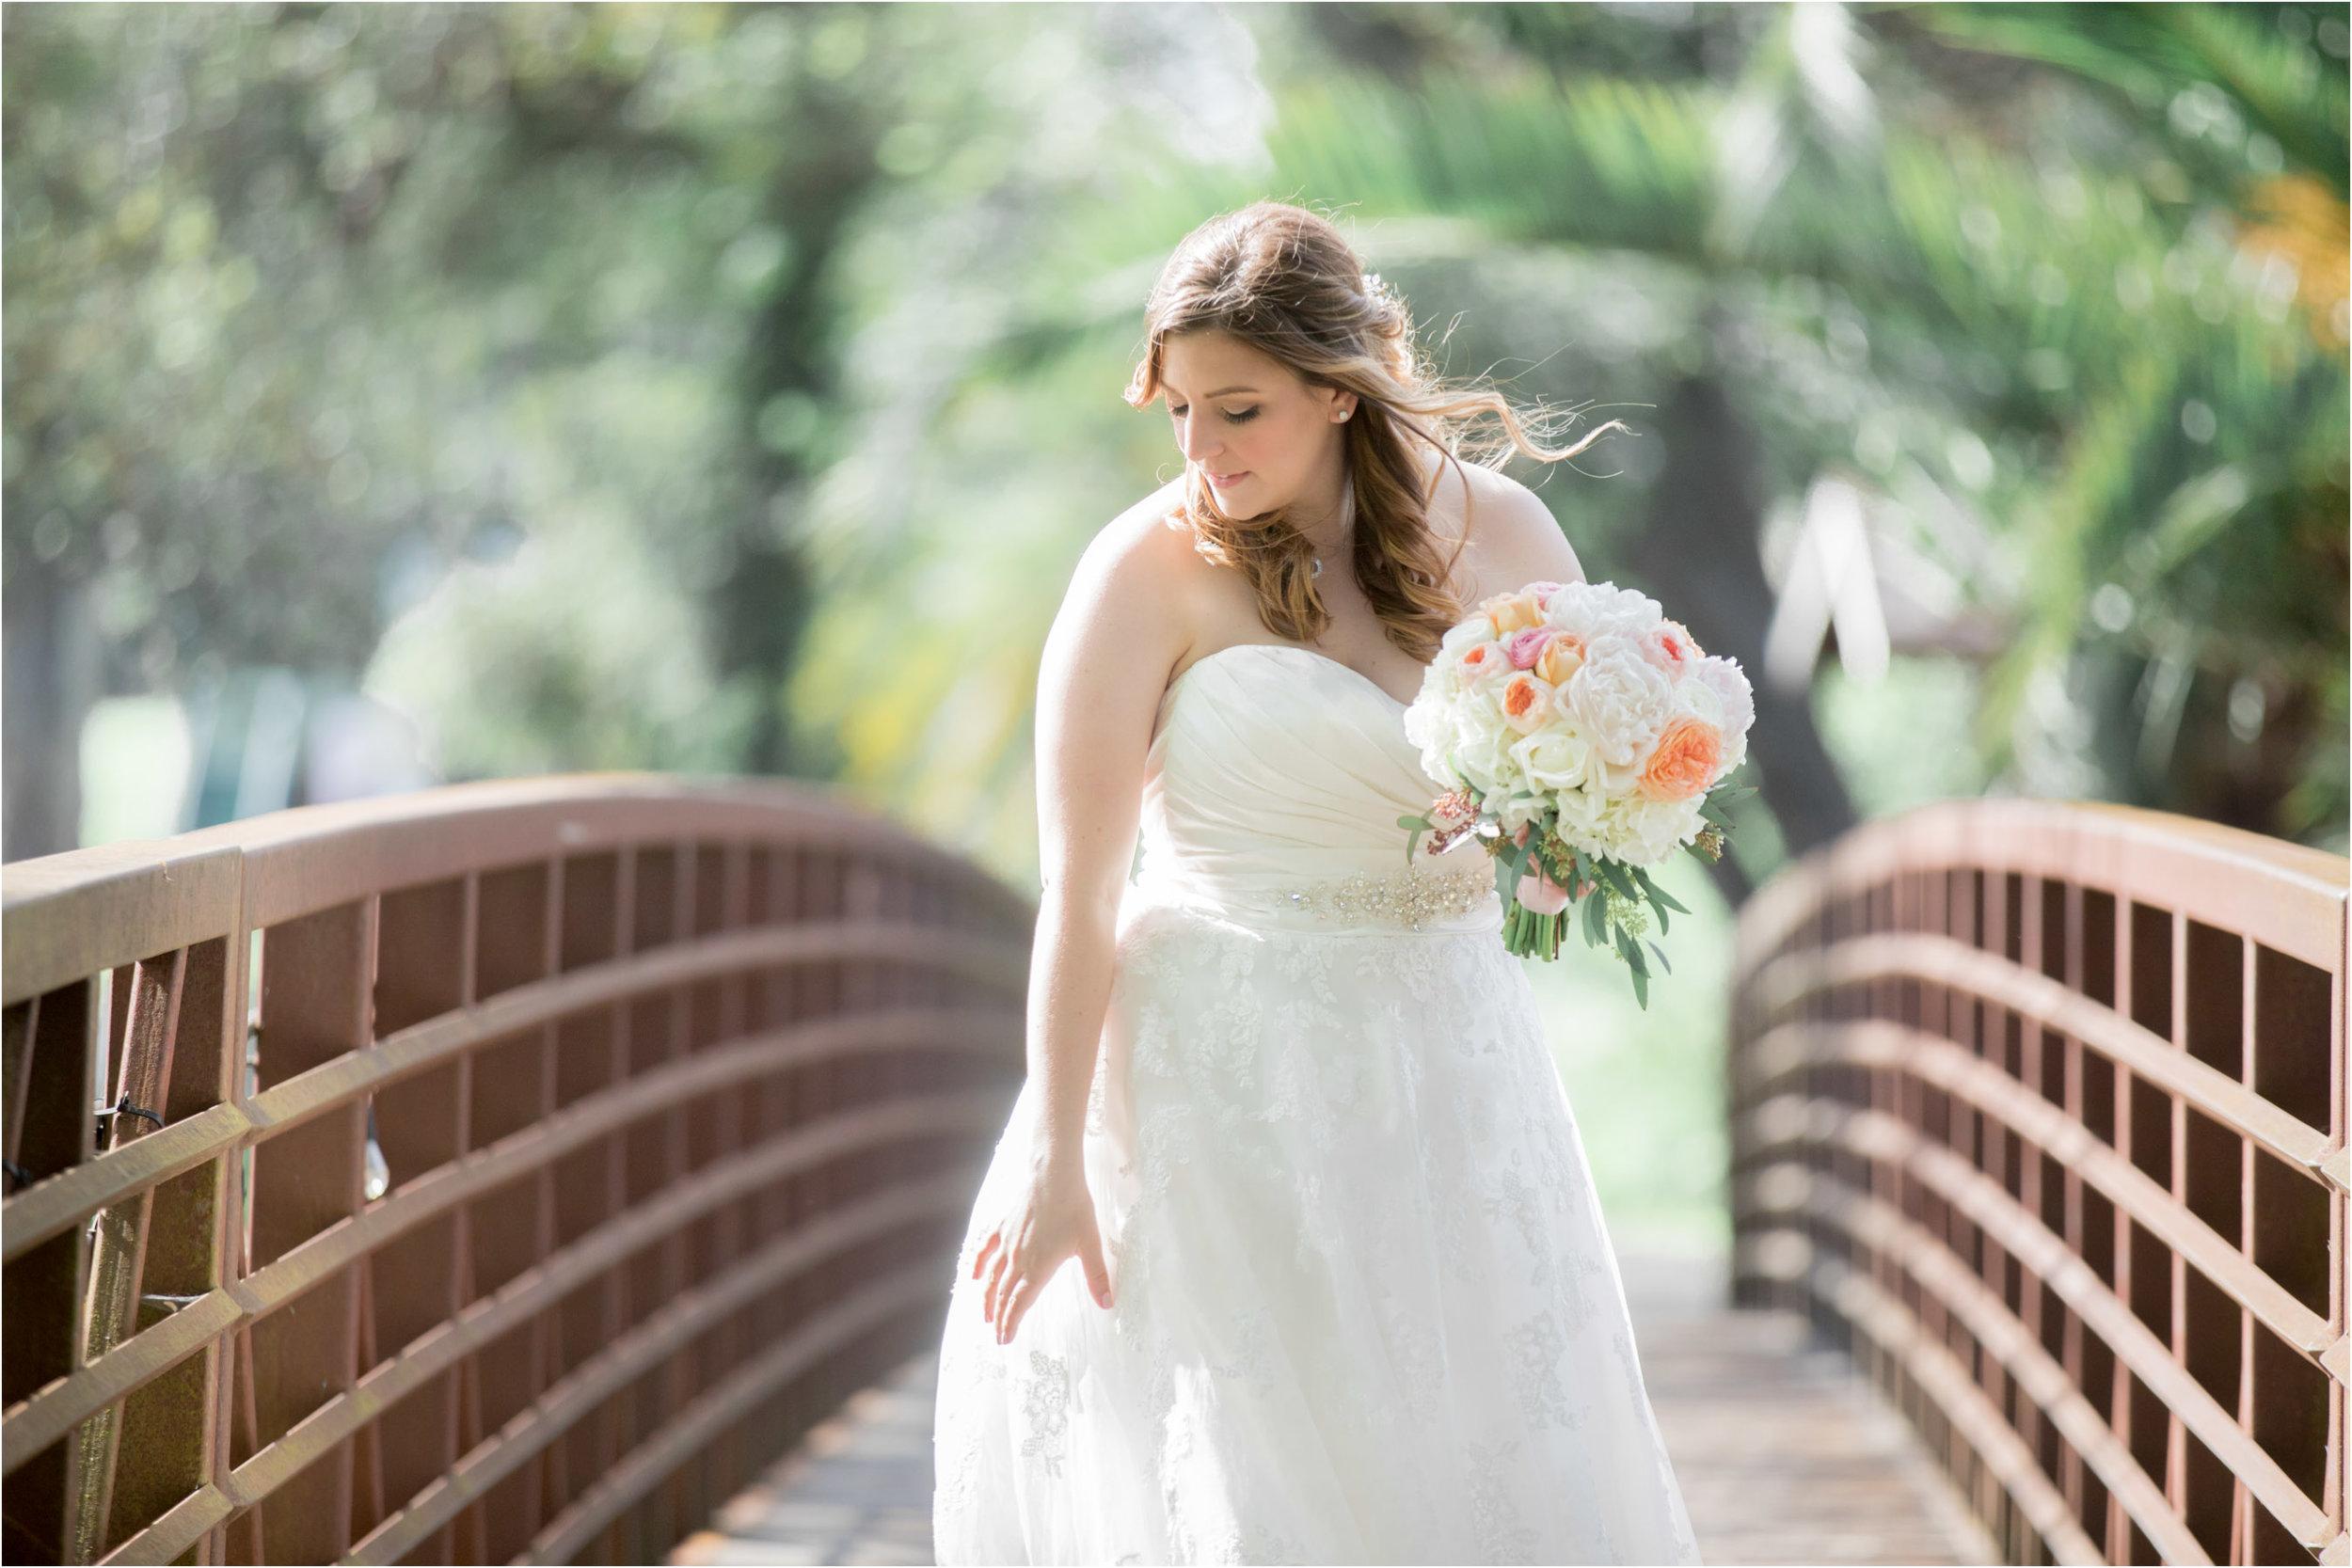 JennaBethPhotography-KAWedding-10.jpg